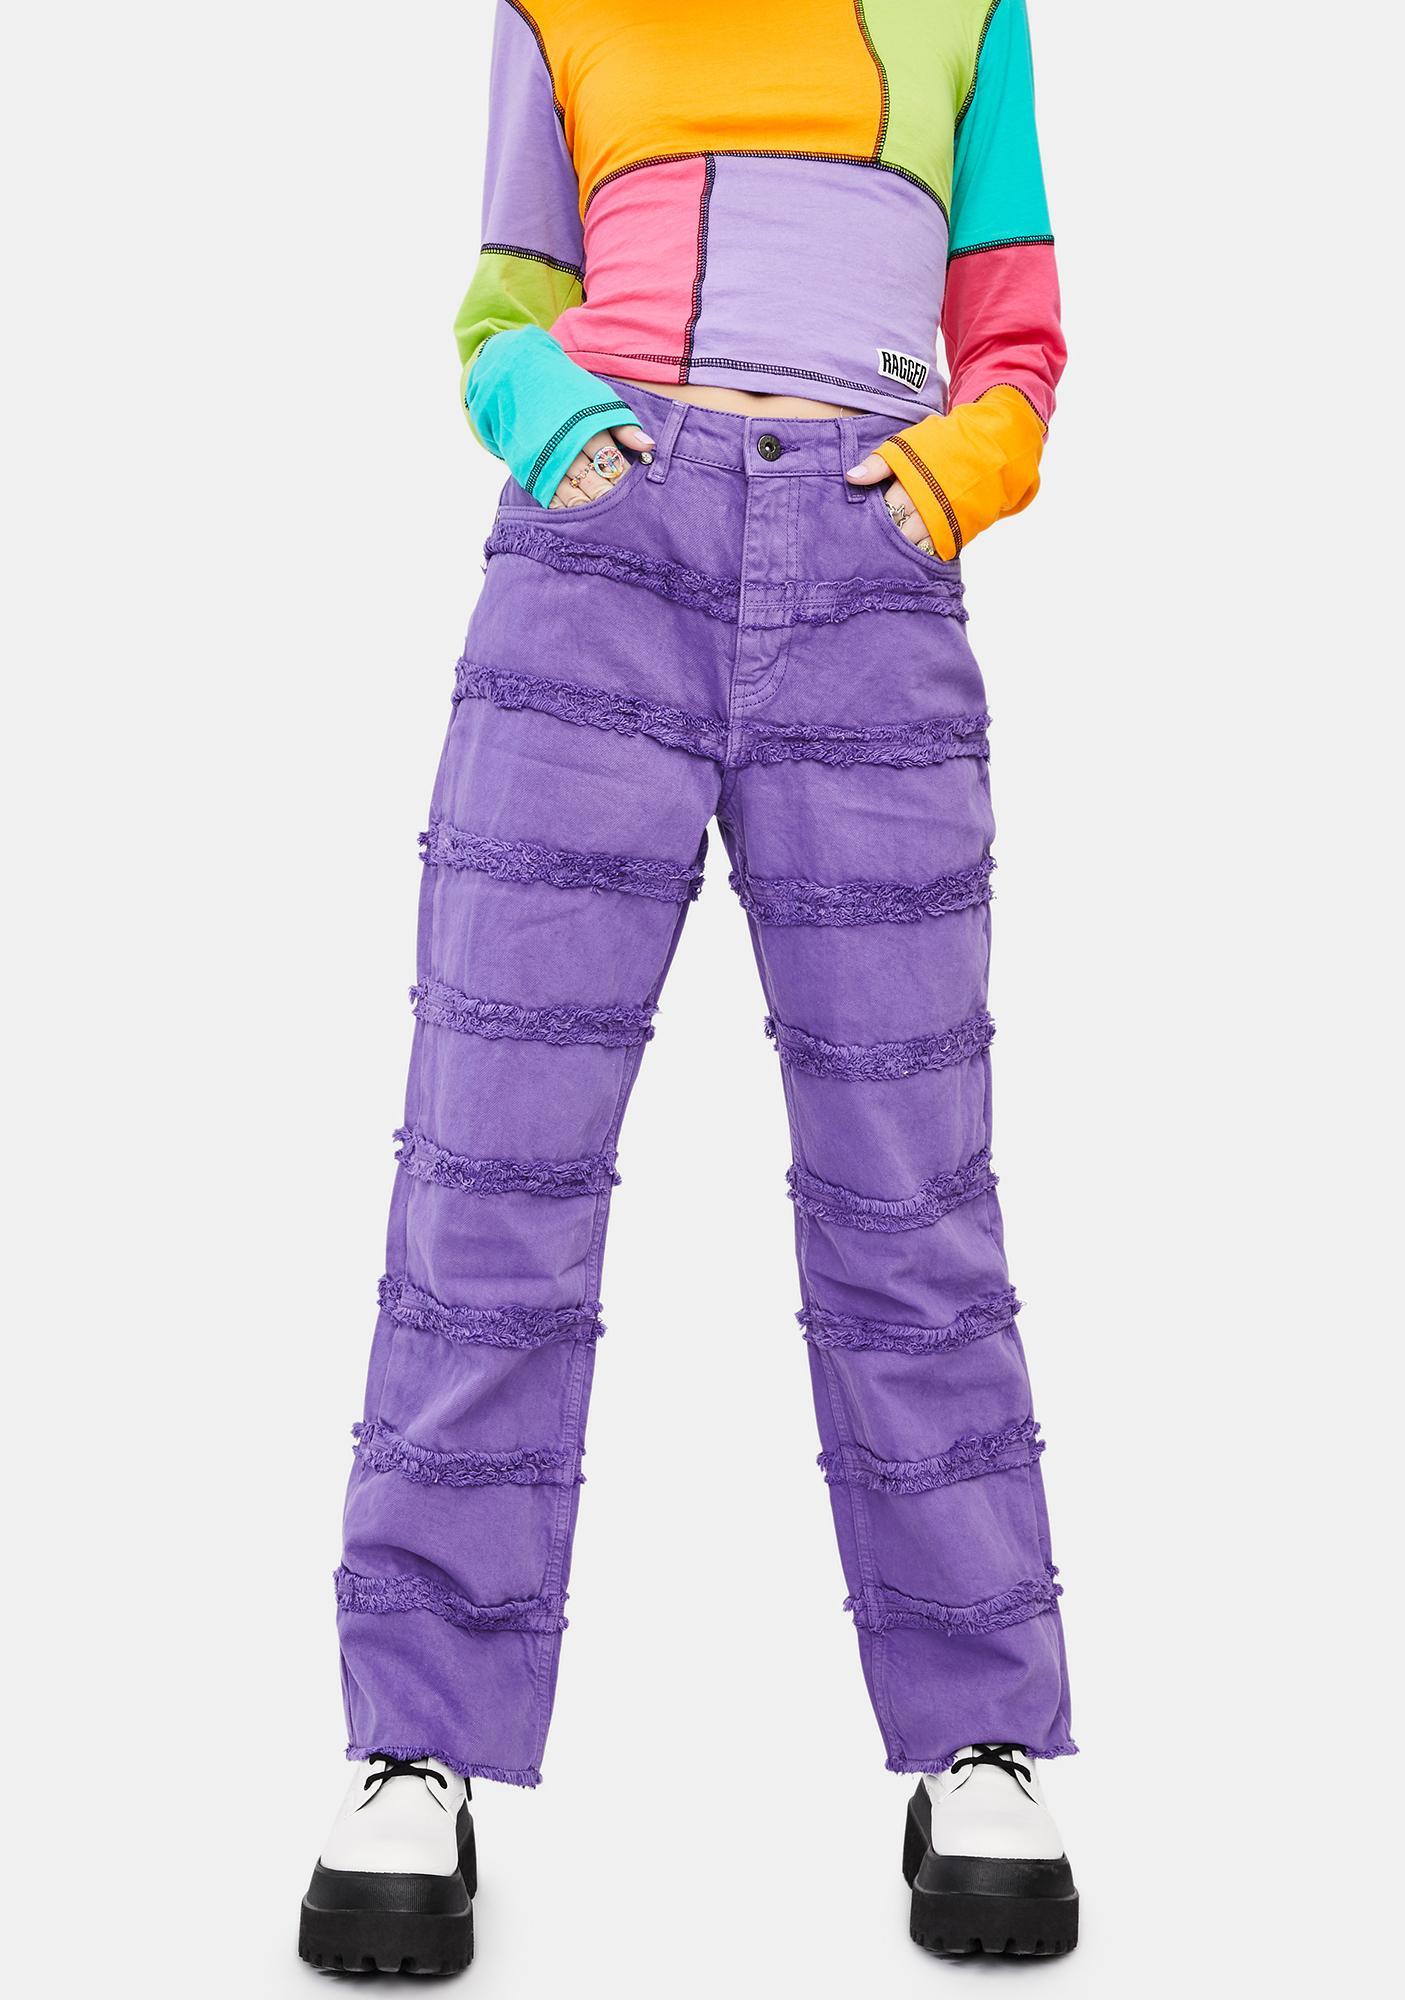 The Ragged Priest Purple Crook Distressed Denim Jeans